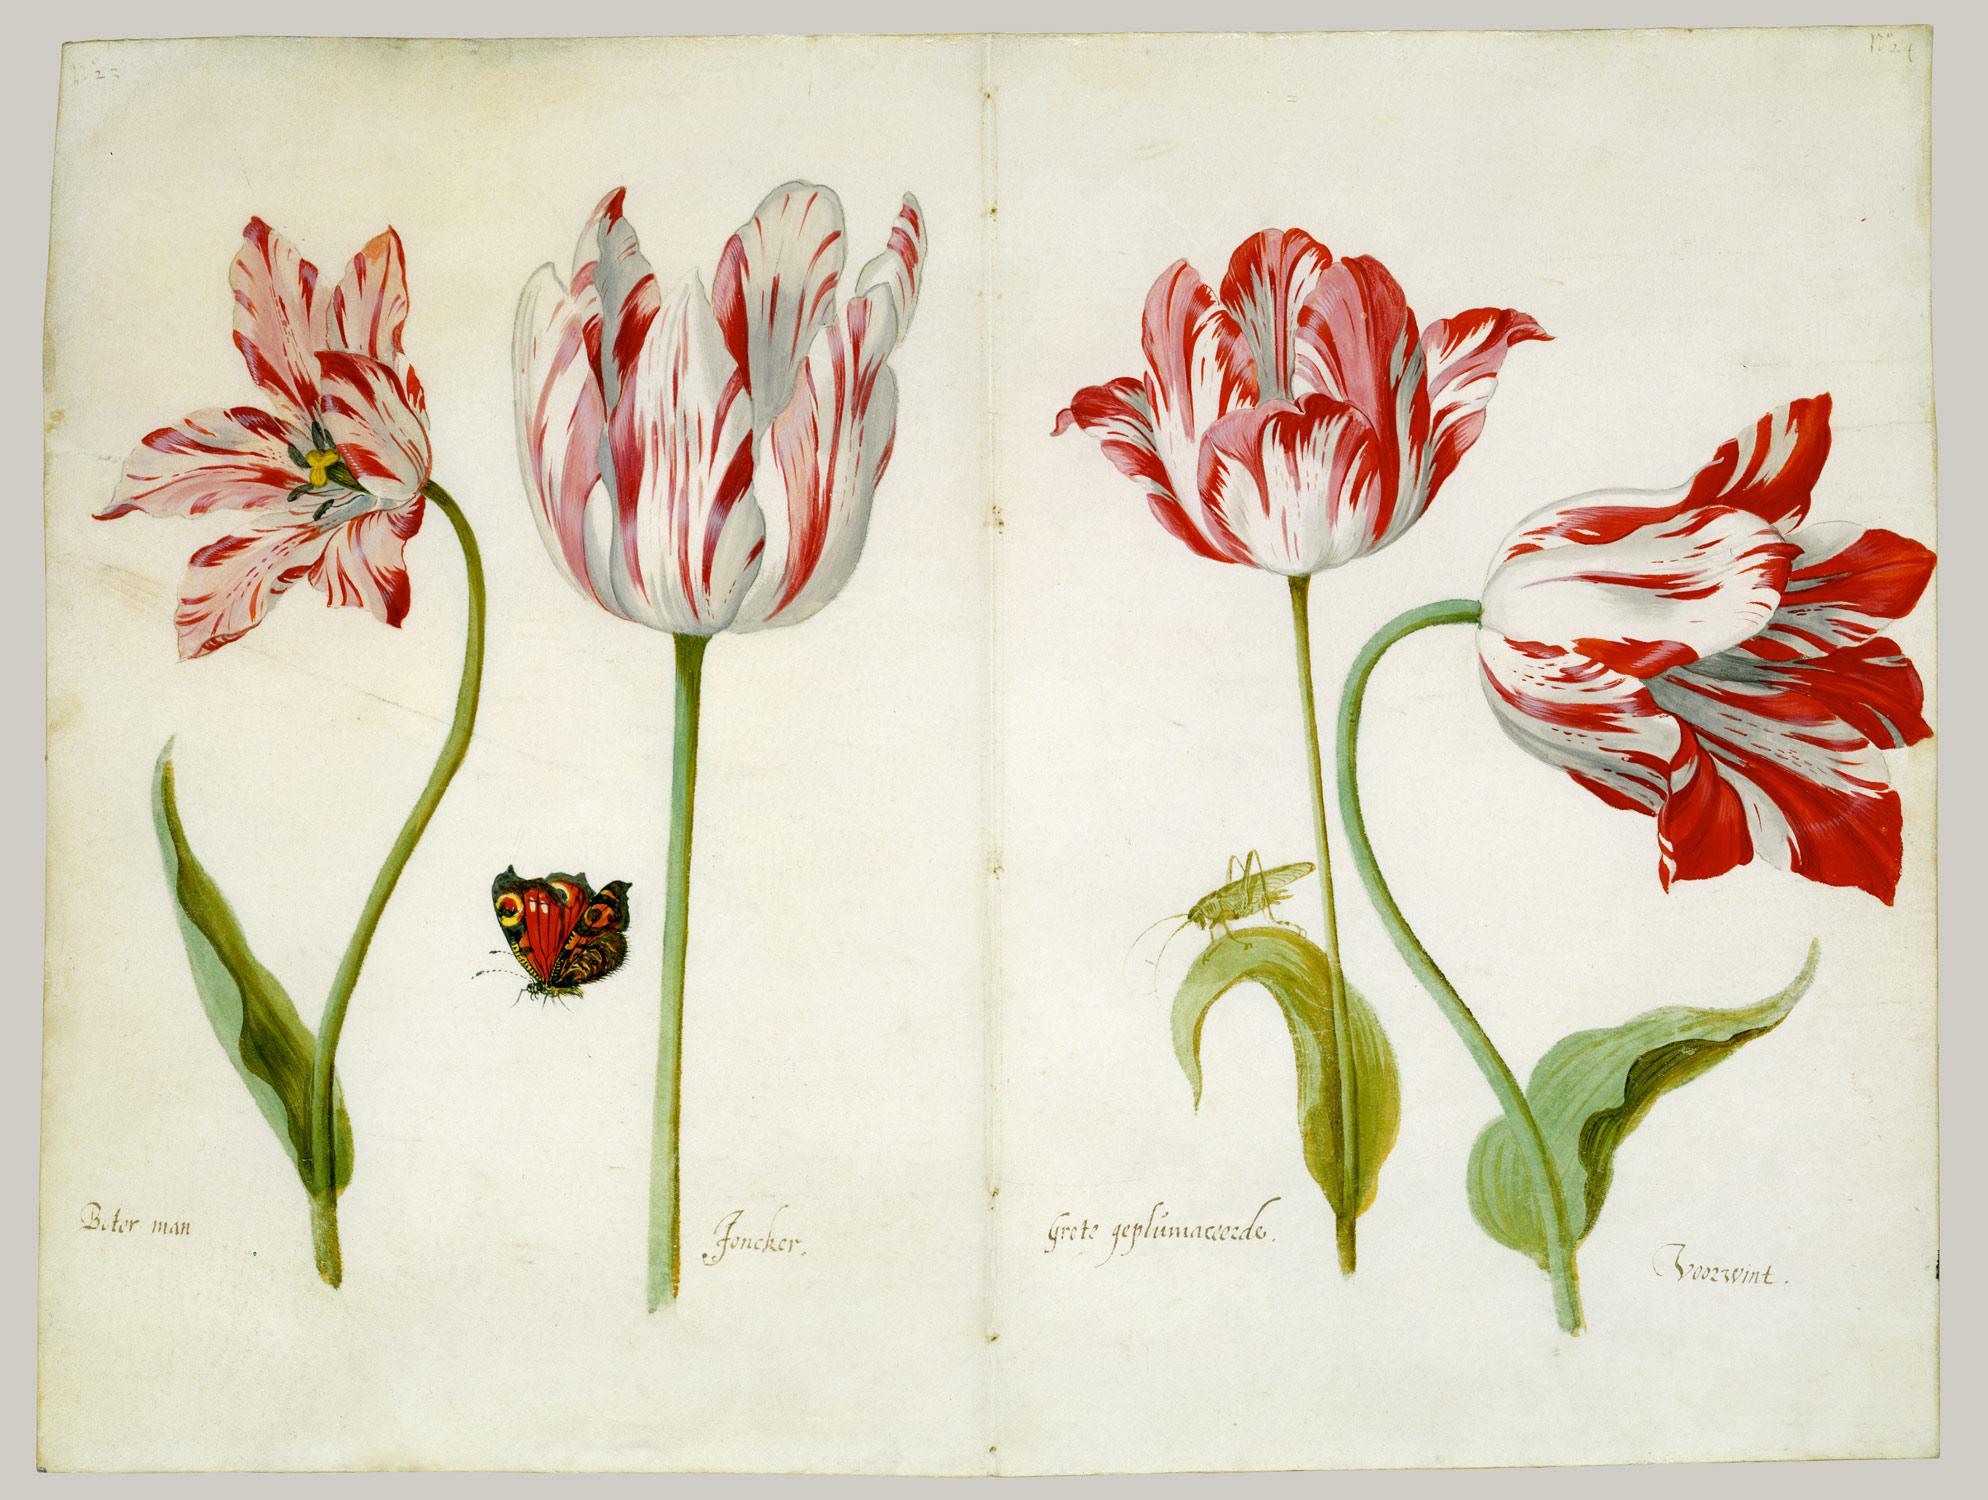 Jacob Marrel, Four Tulips: Boter man (Butter Man), Joncker (Nobleman), Grote geplumaceerde (The Great Plumed One), and Voorwint (With the Wind), ca. 1635–45. Met Museum.